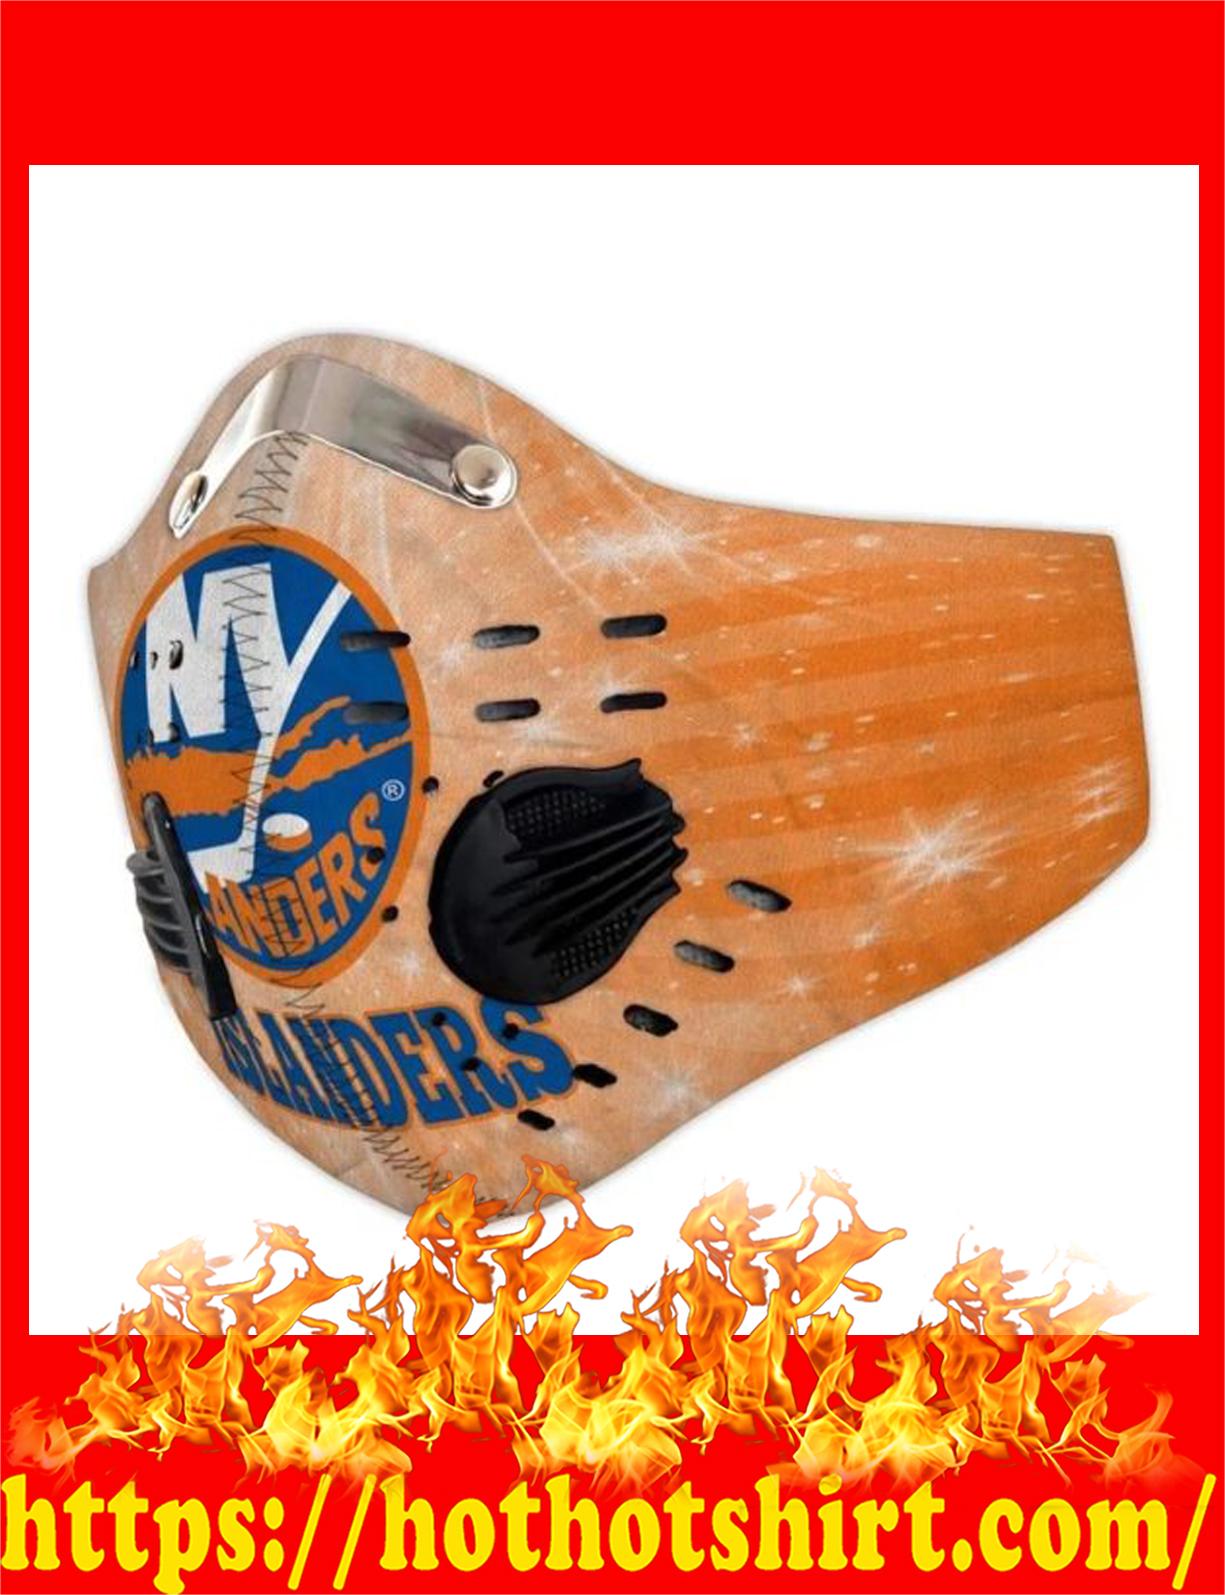 New york islanders filter face mask - detail